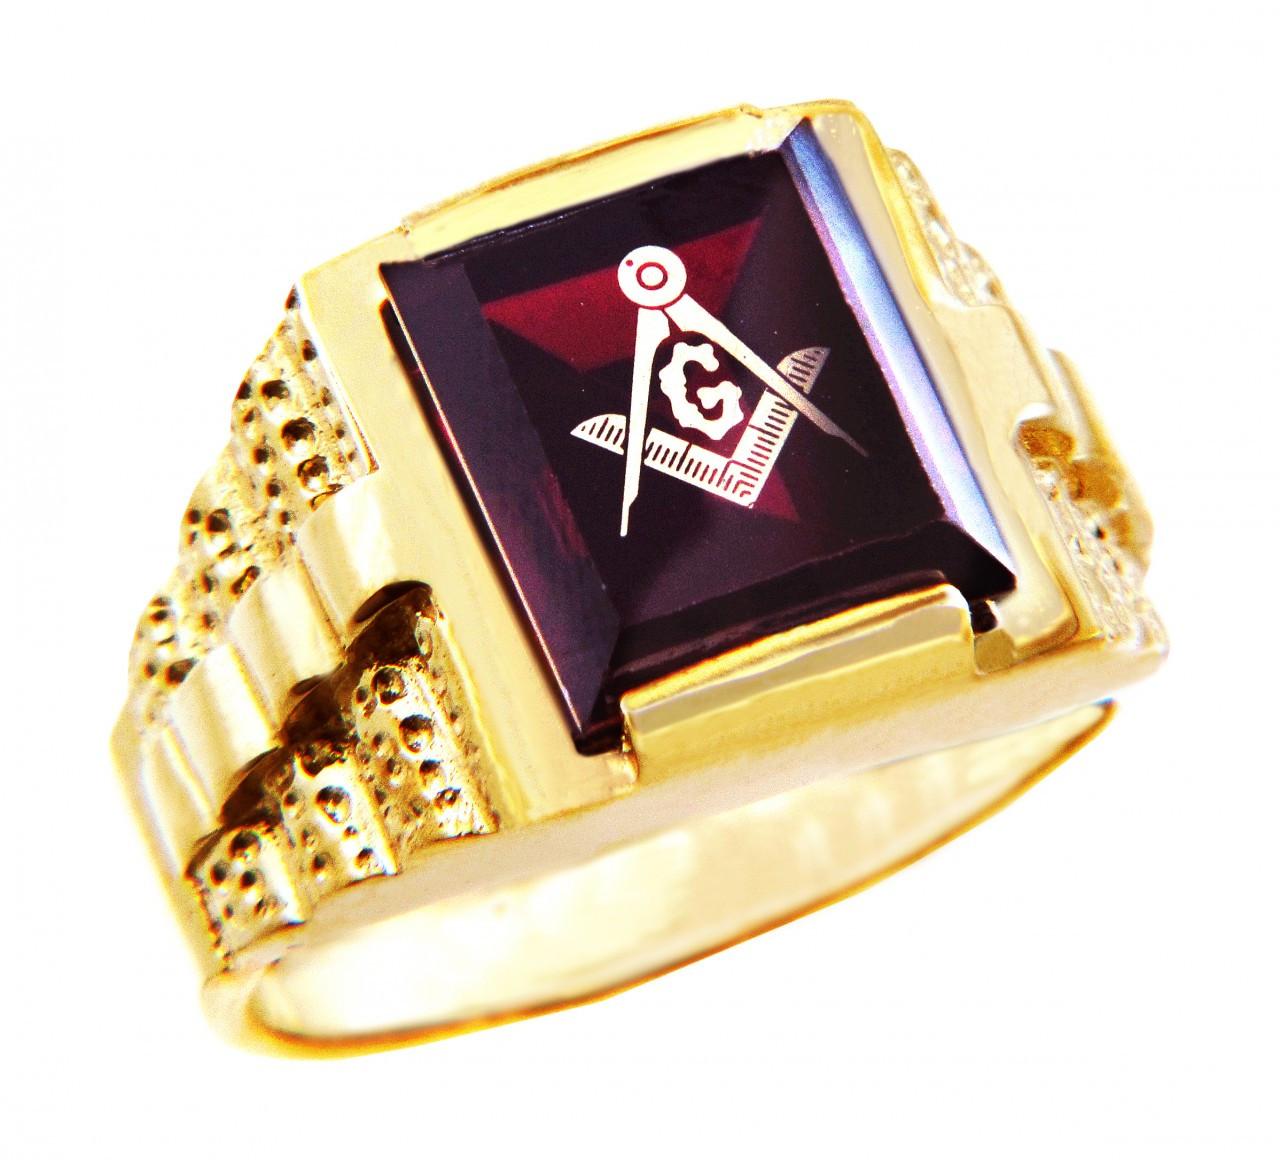 Mens Polished 10k Rose Gold Round Top Freemason Square and Compass Masonic Ring